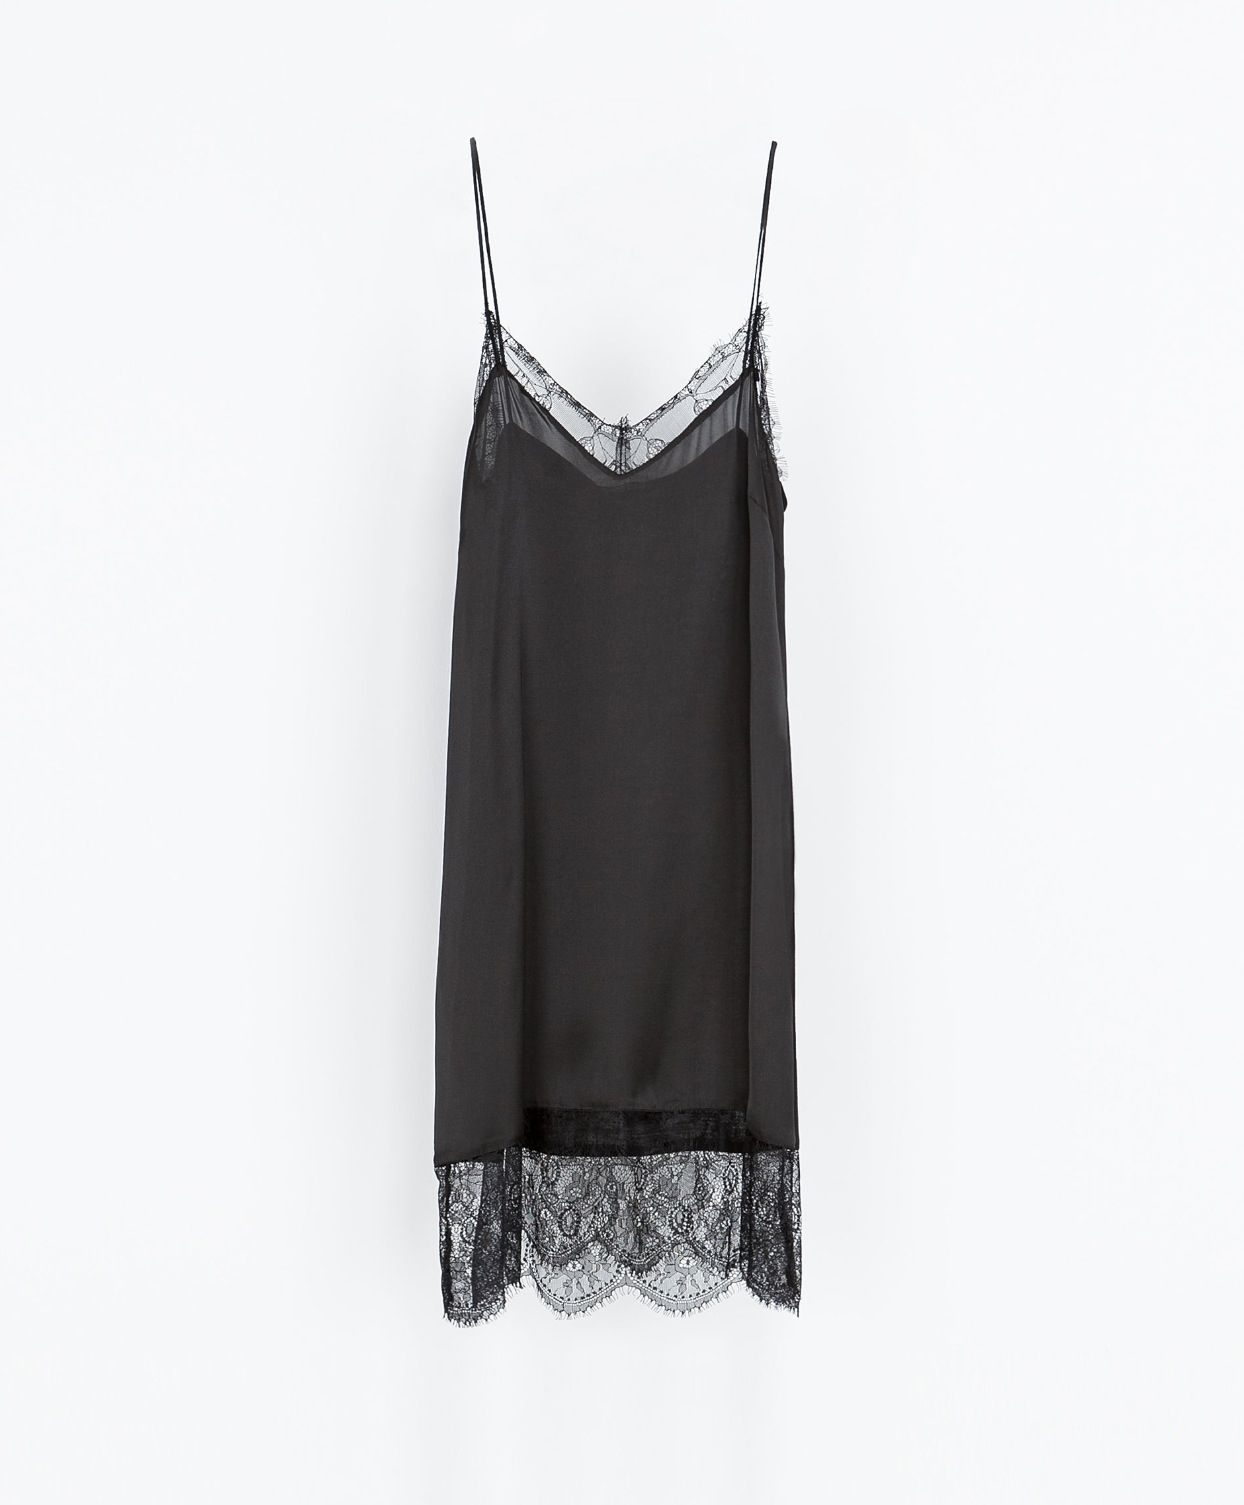 14961483845c6 Zara Slip Dress | la mode | Lingerie dress, Fashion, Fashion dresses